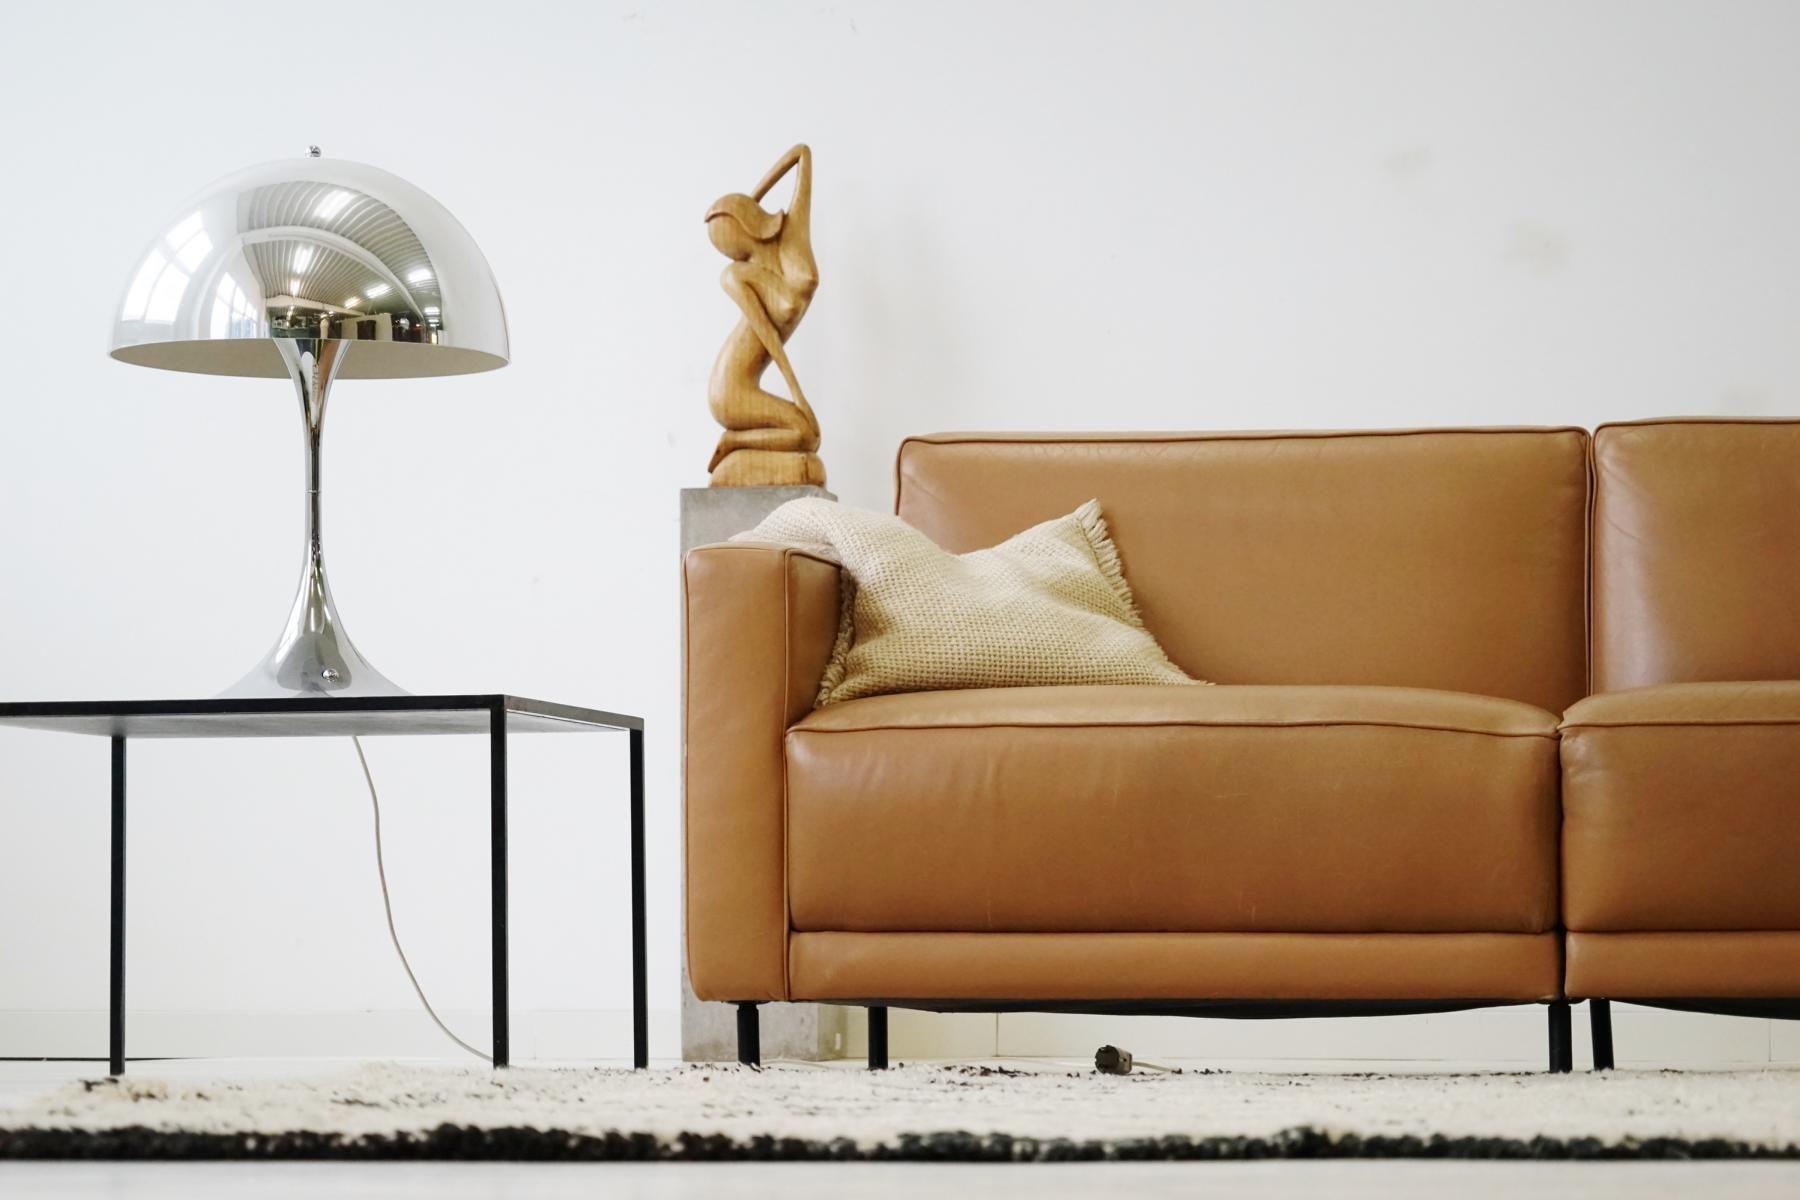 Large Vintage Leather Sofa By Kaufeld Haussmann For De Sede Vintage Leather Sofa Leather Sofa Chair Design